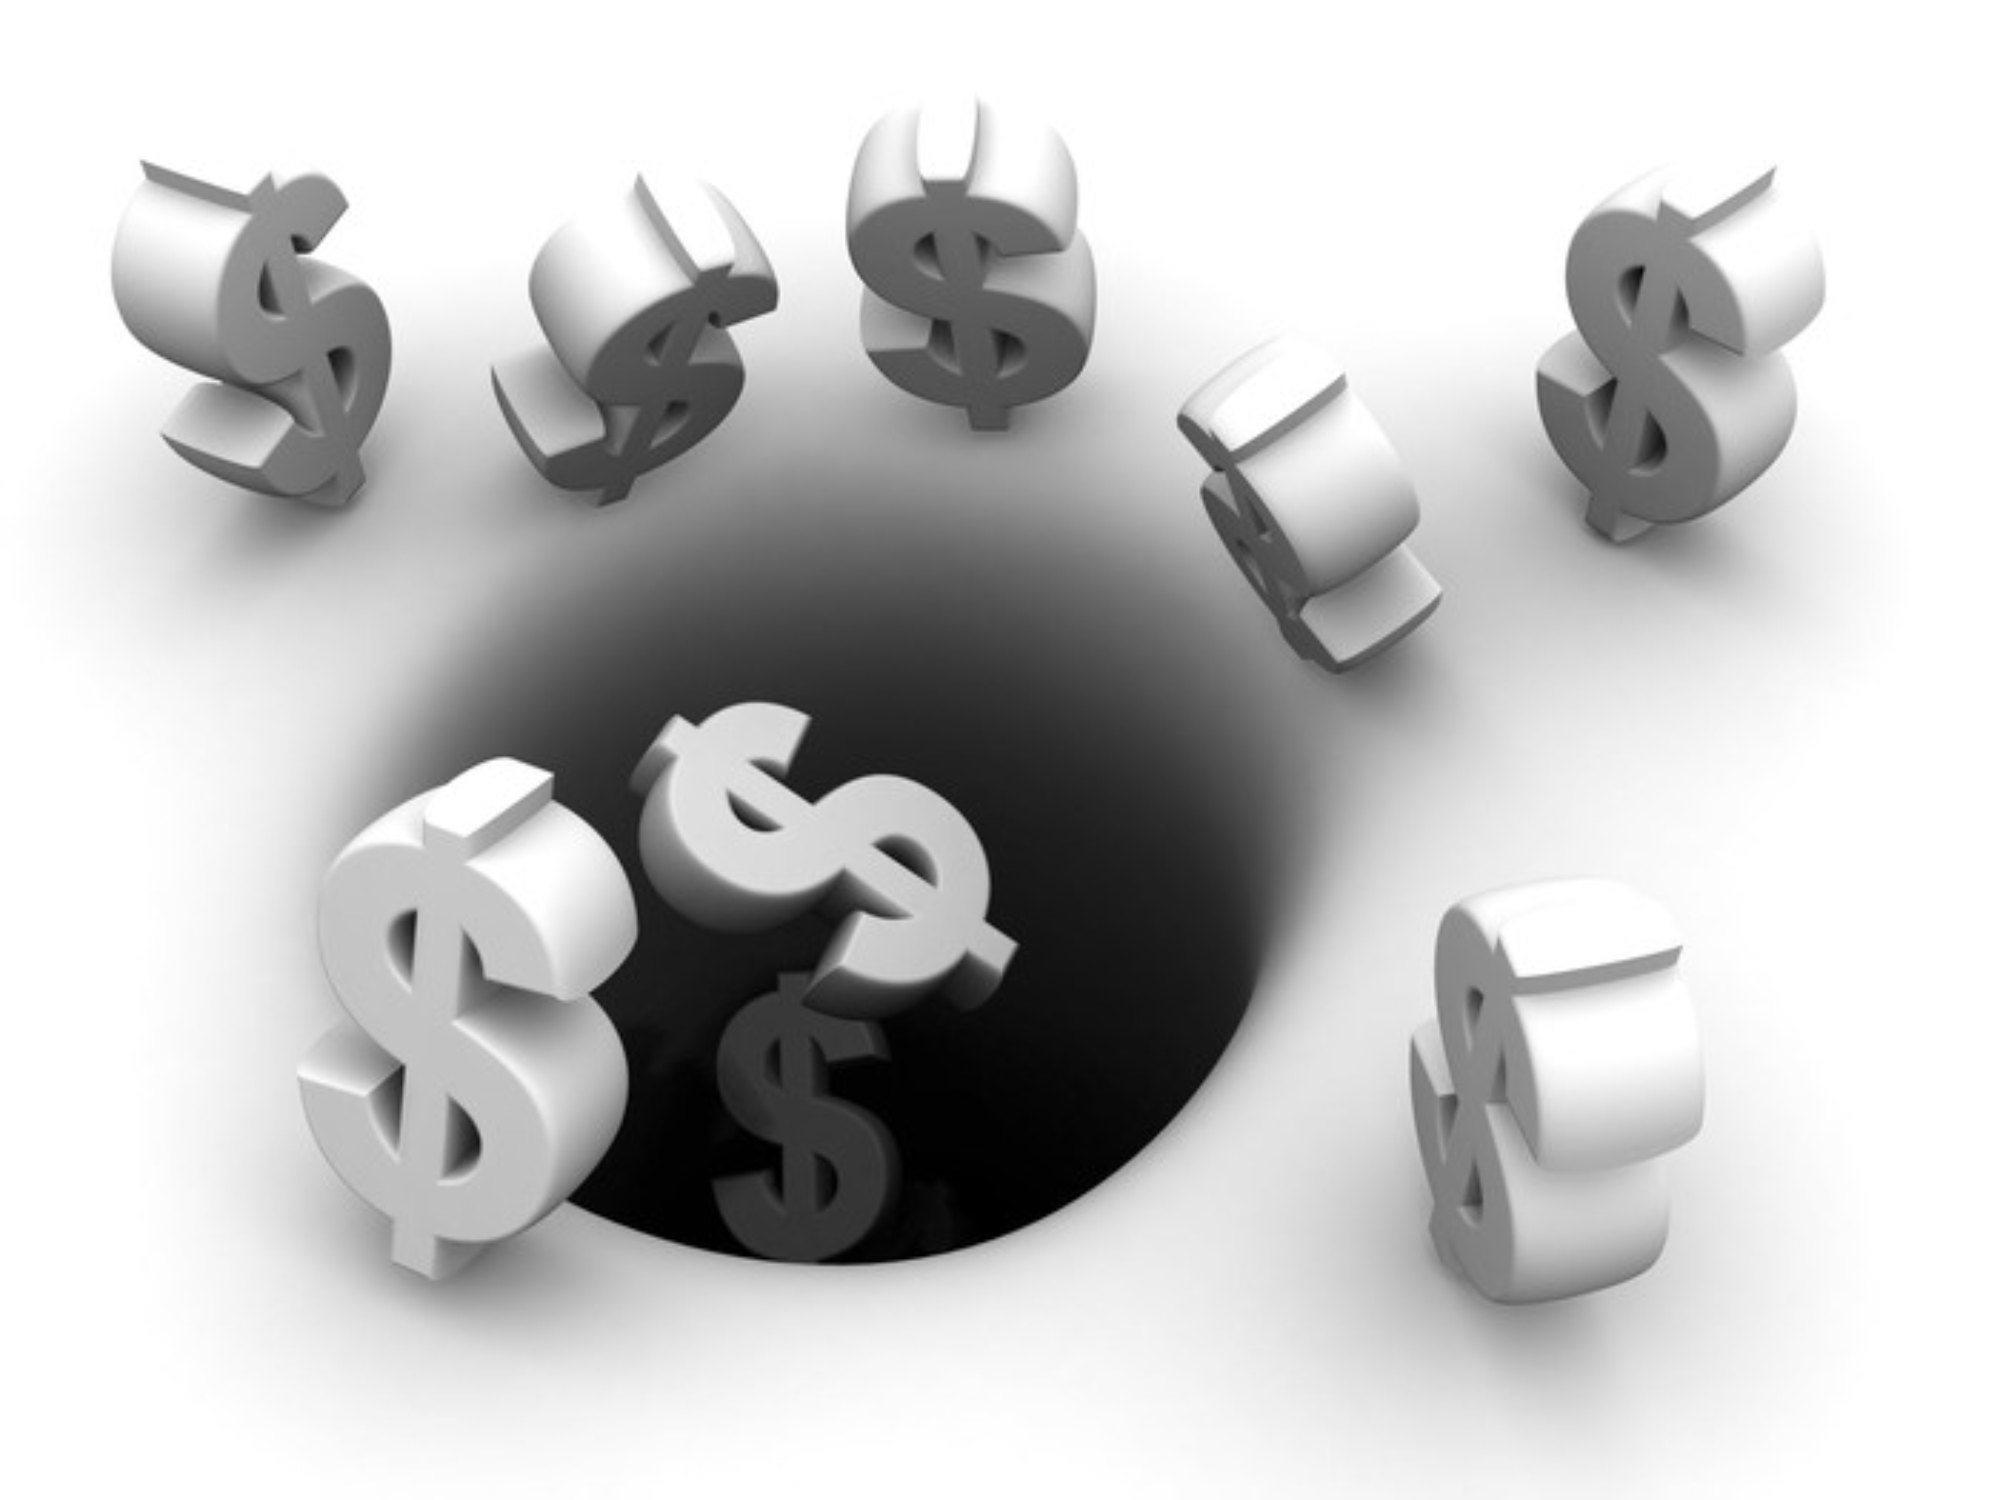 dollar signs falling down black hole